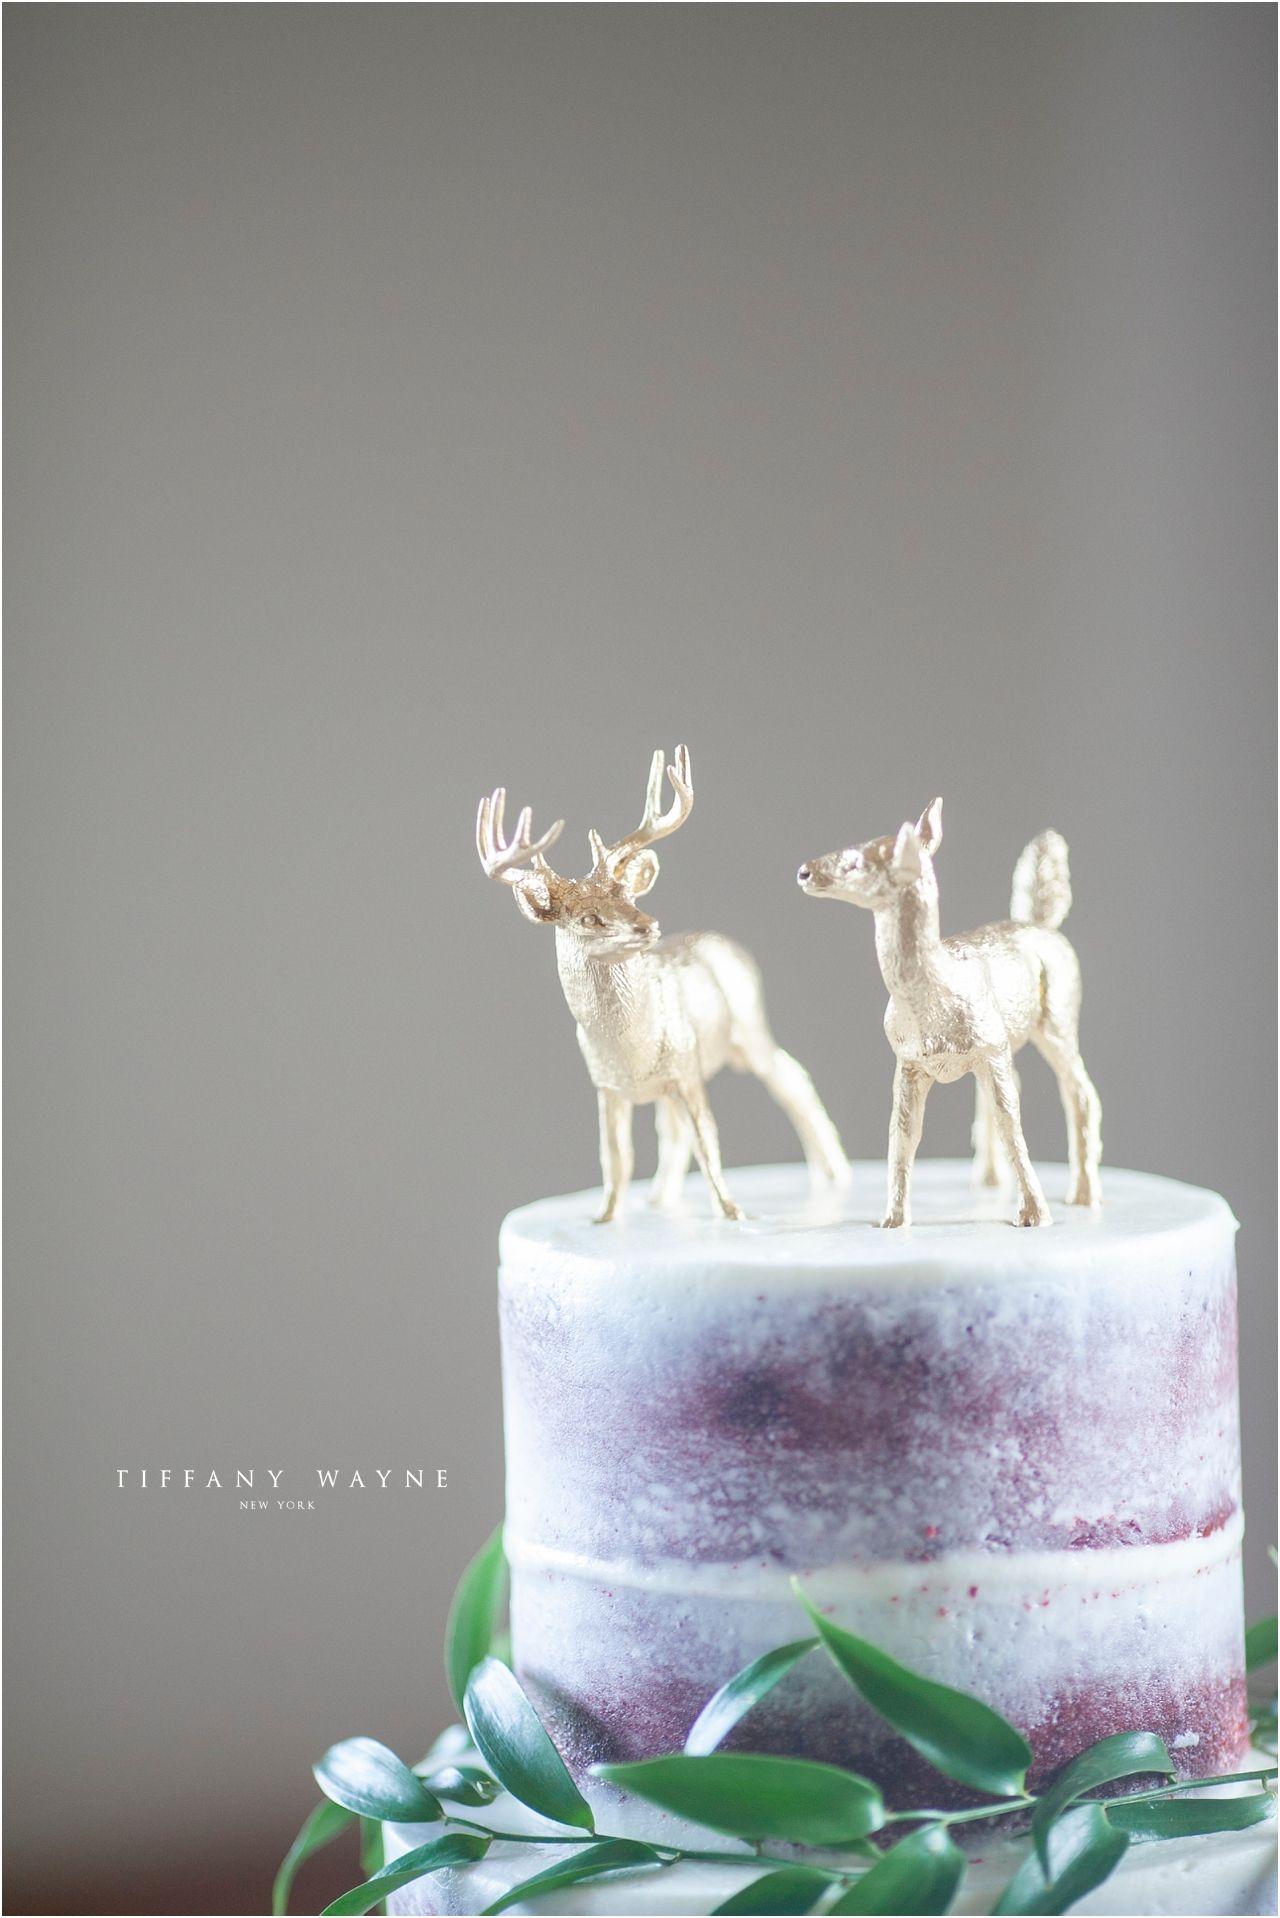 Gold wedding cake topper ideas dear wedding cake topper winter